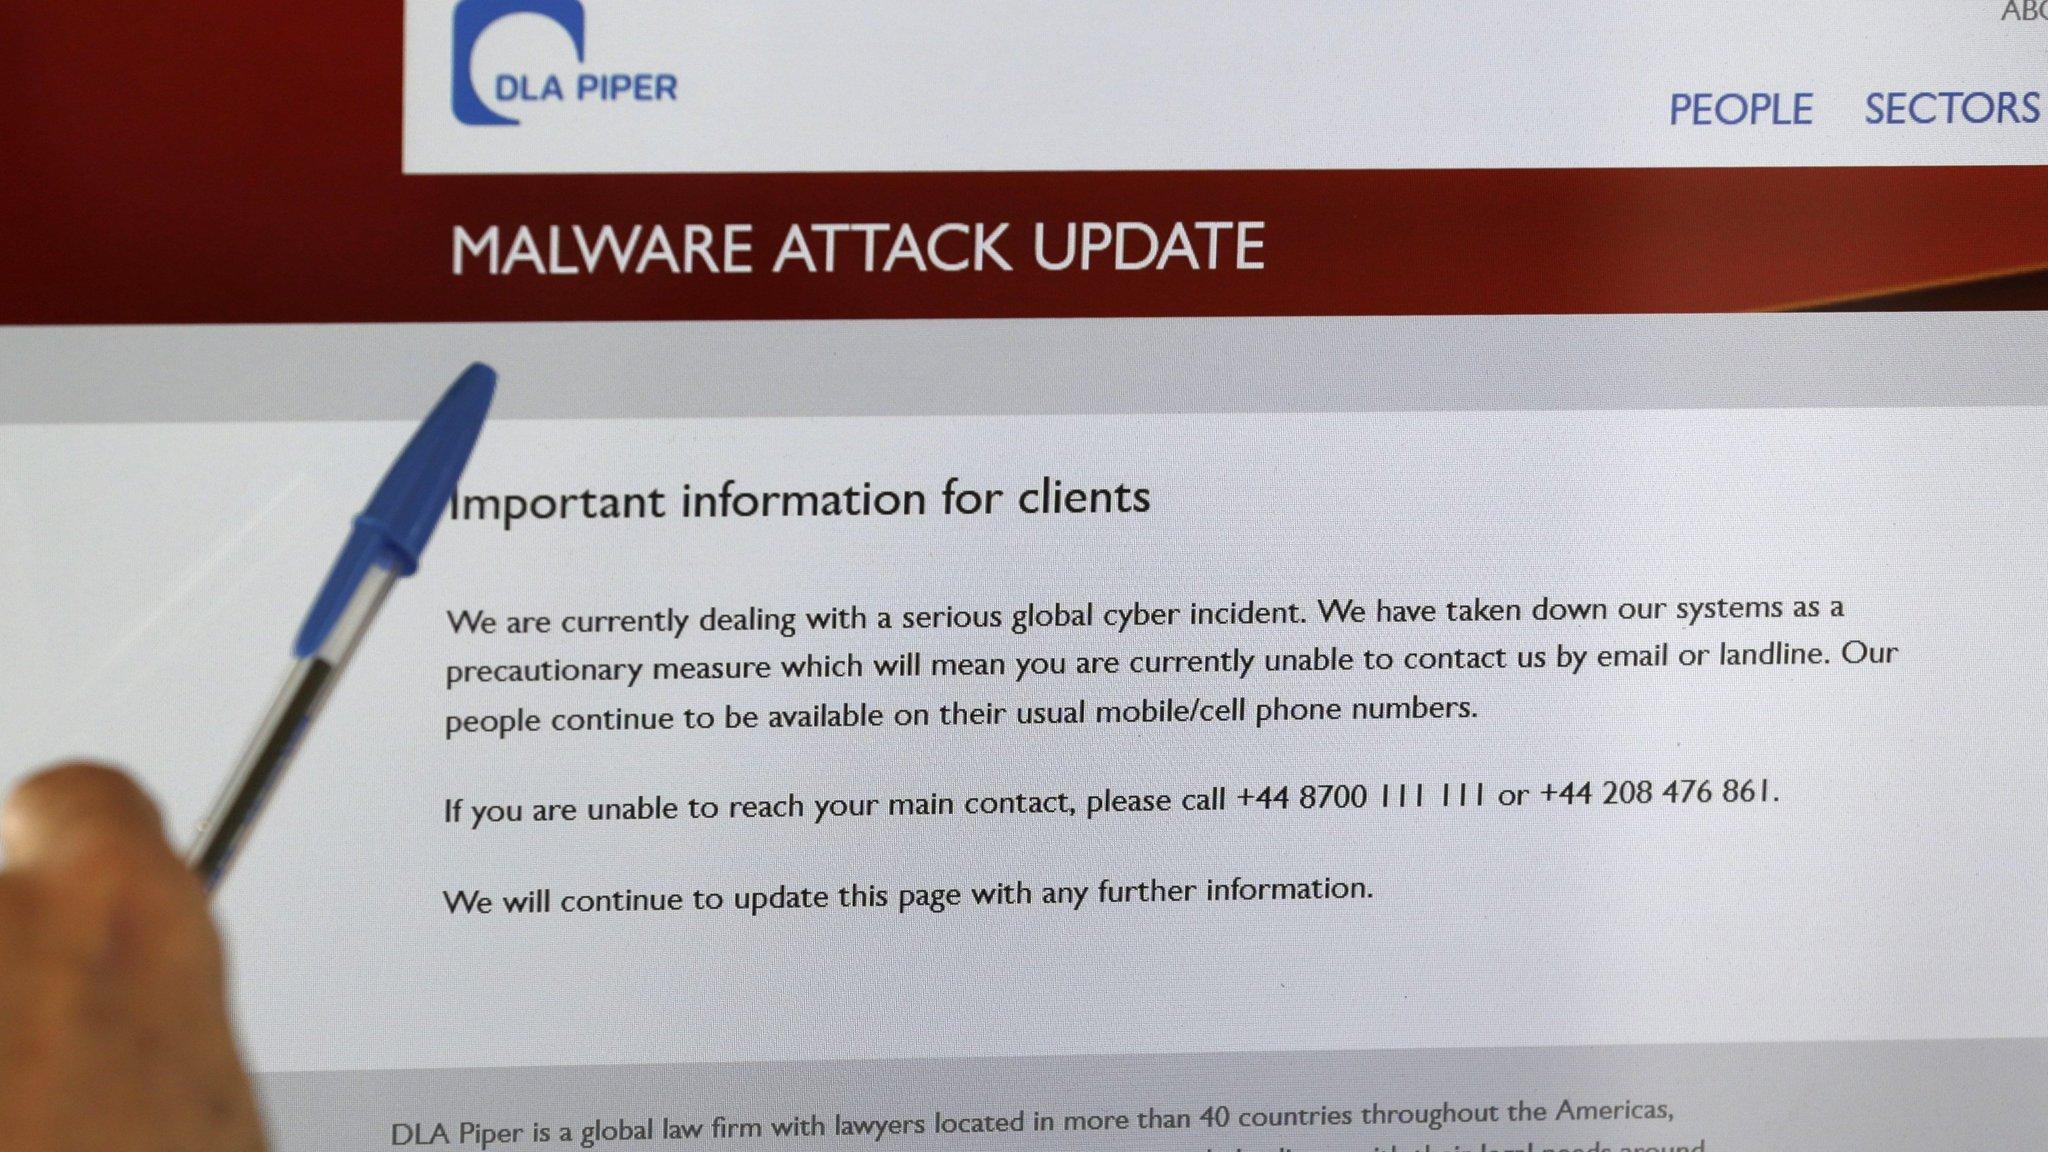 DLA Piper still struggling with Petya cyber attack